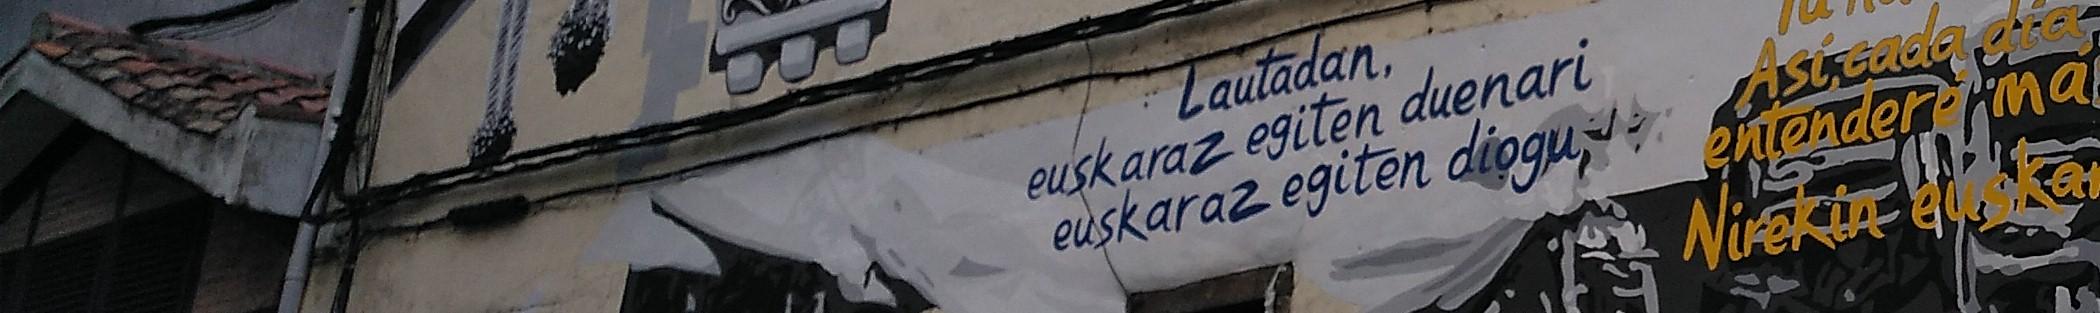 Guía De Euskera Wikiviajes